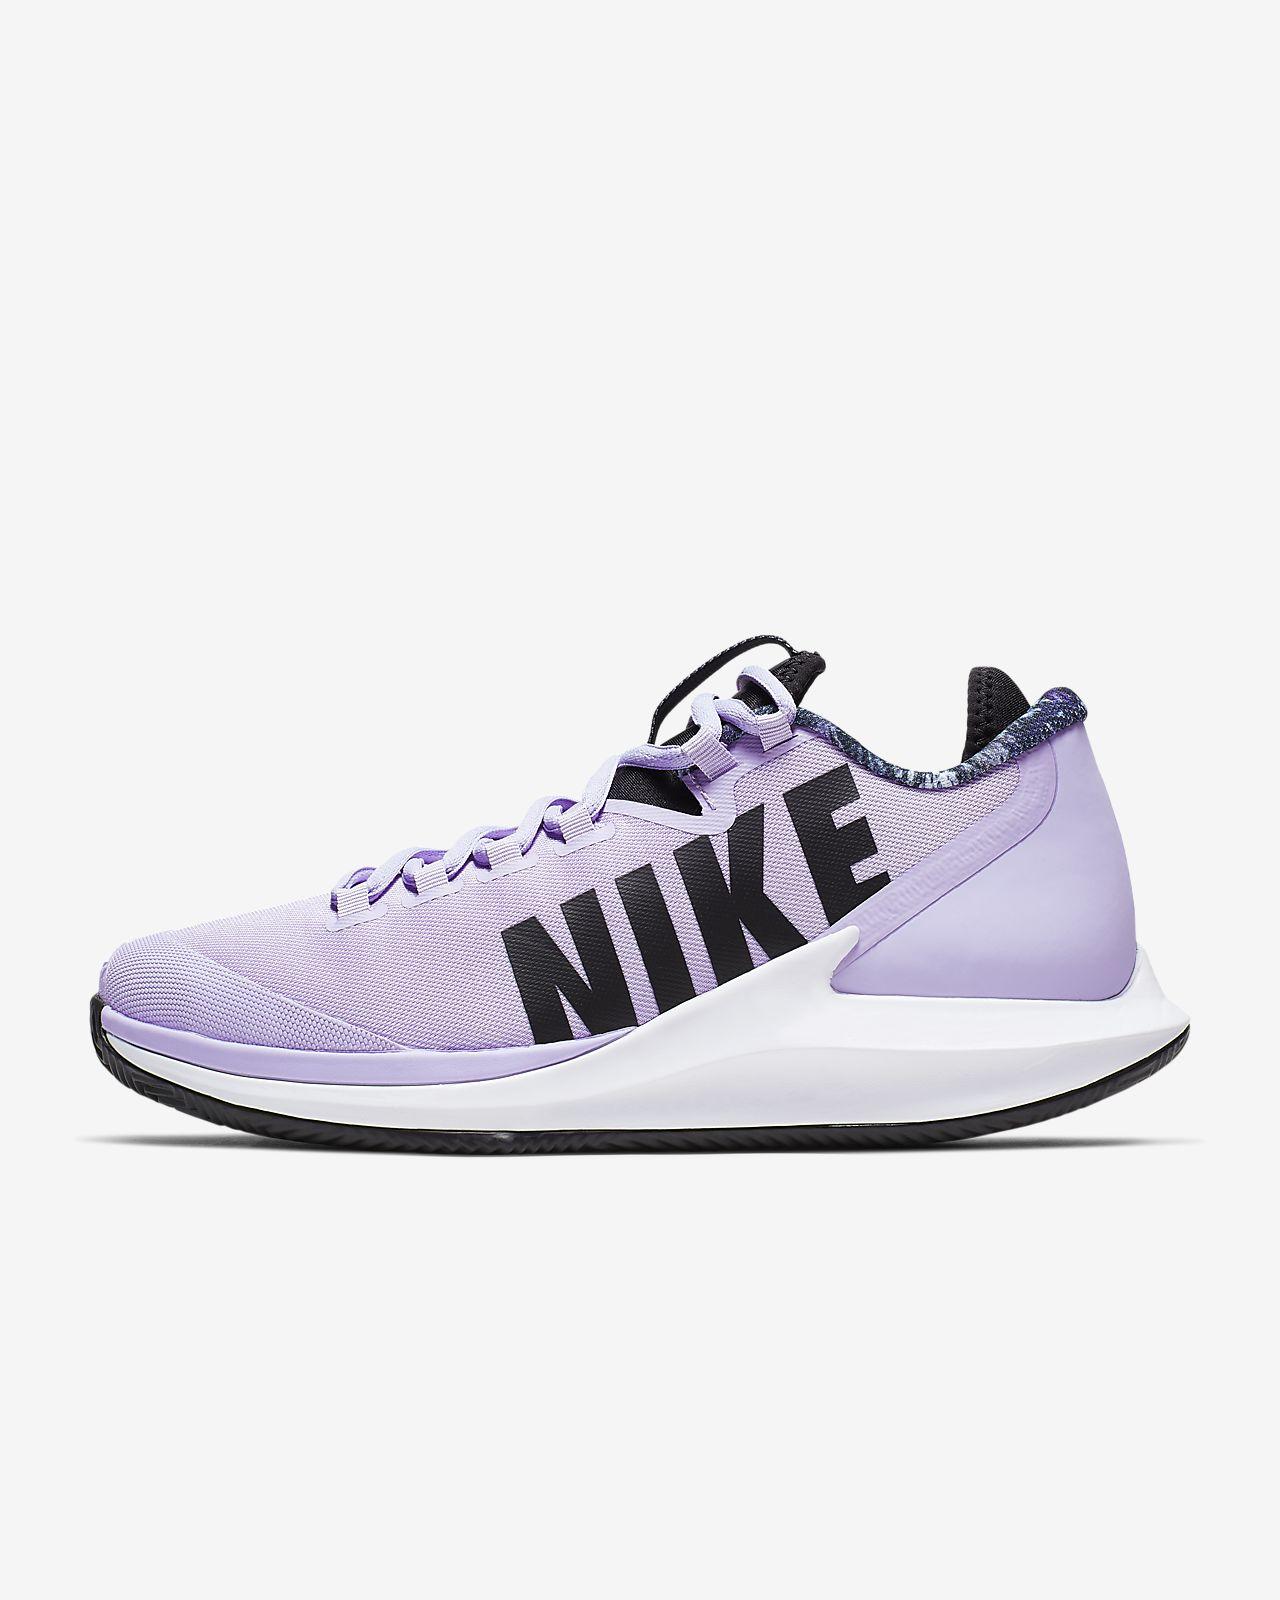 NikeCourt Air Zoom Zero Clay tennissko til dame